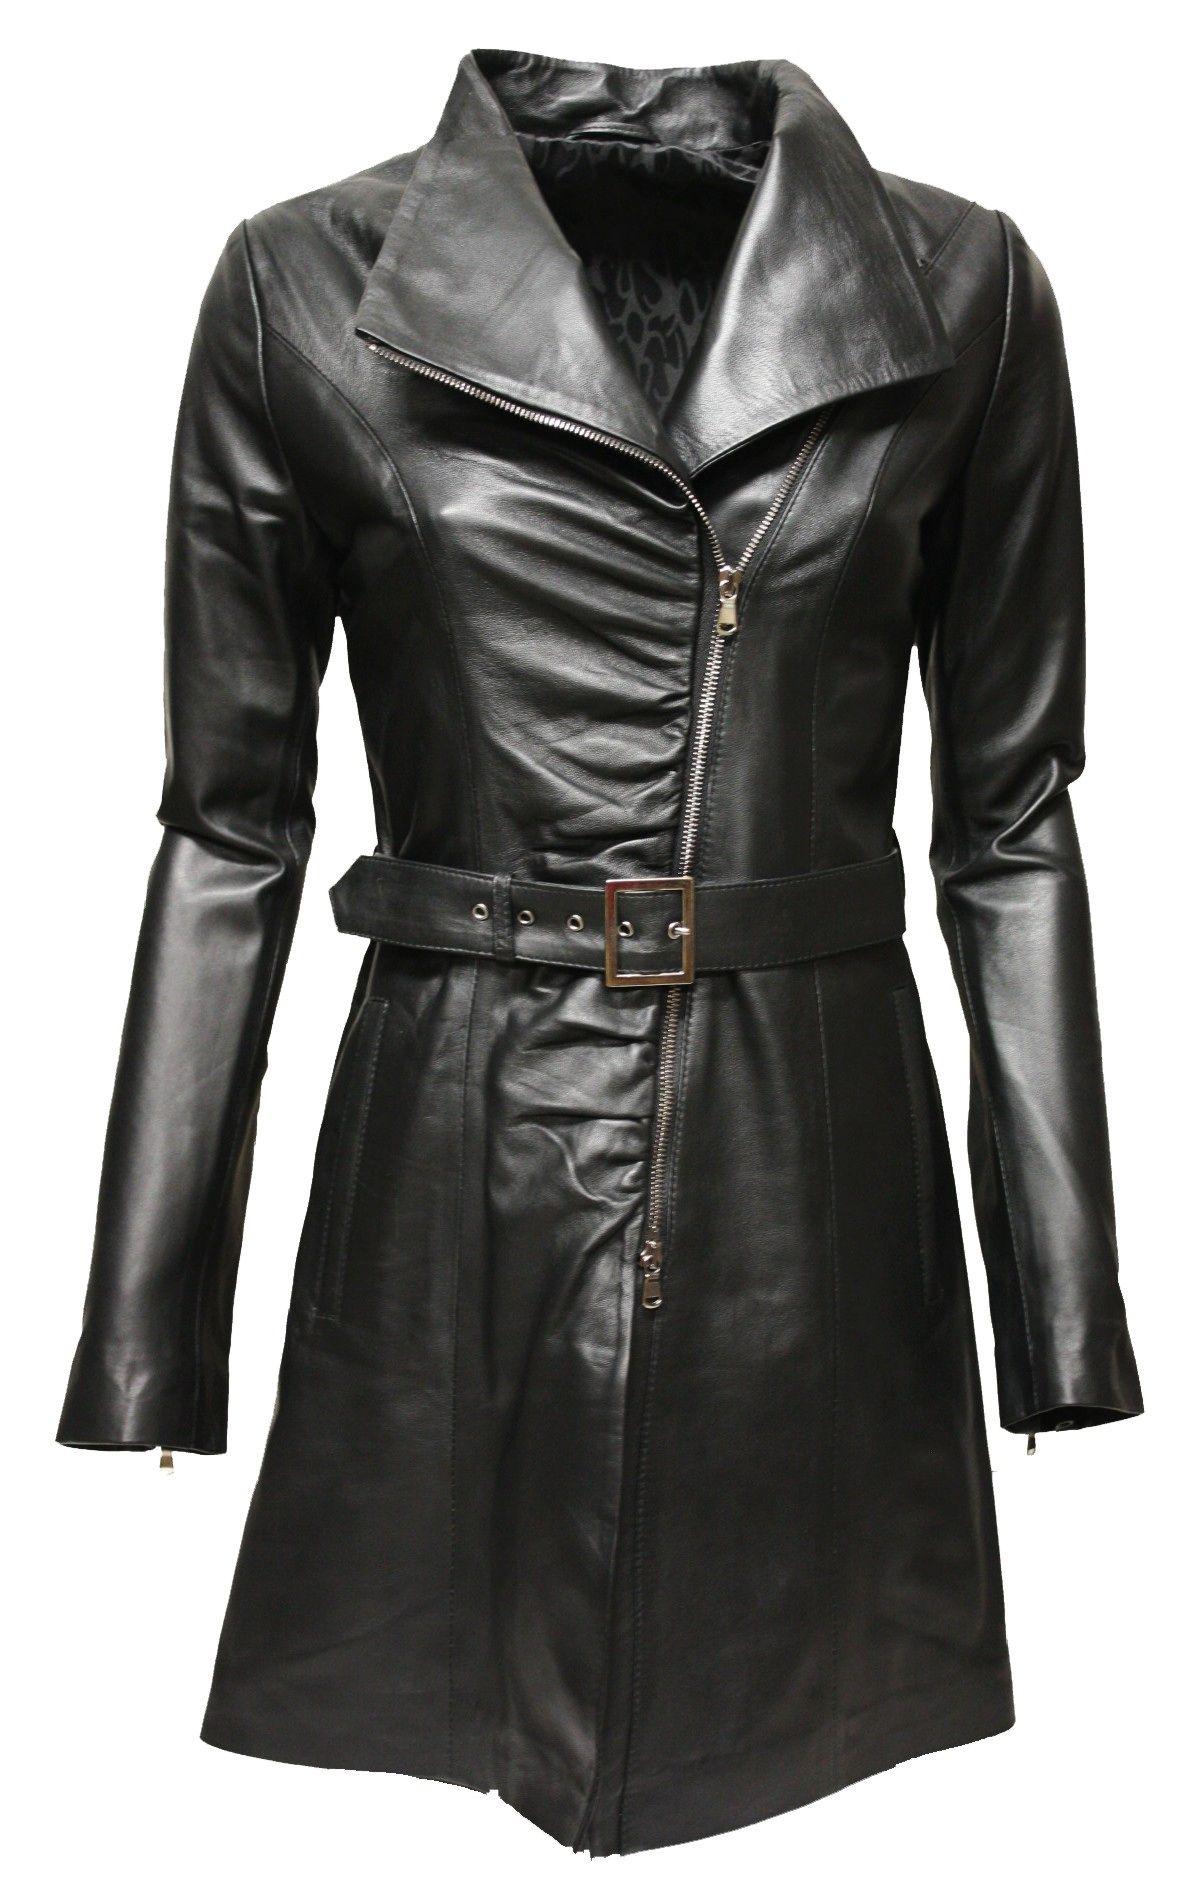 die besten 25 ledermantel damen ideen auf pinterest mantel navy damen schwarze jeansjacke. Black Bedroom Furniture Sets. Home Design Ideas